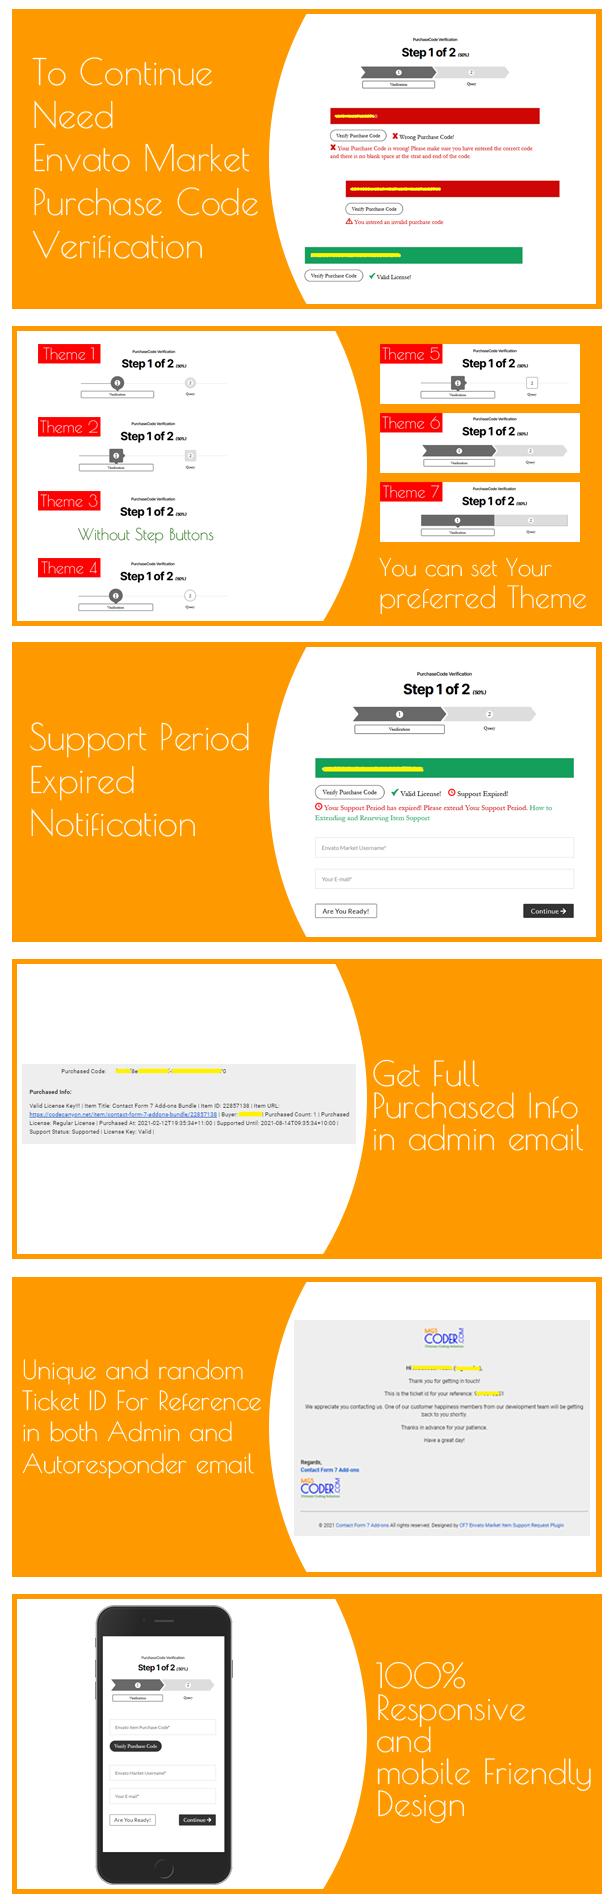 Envato Market Item Support Request features